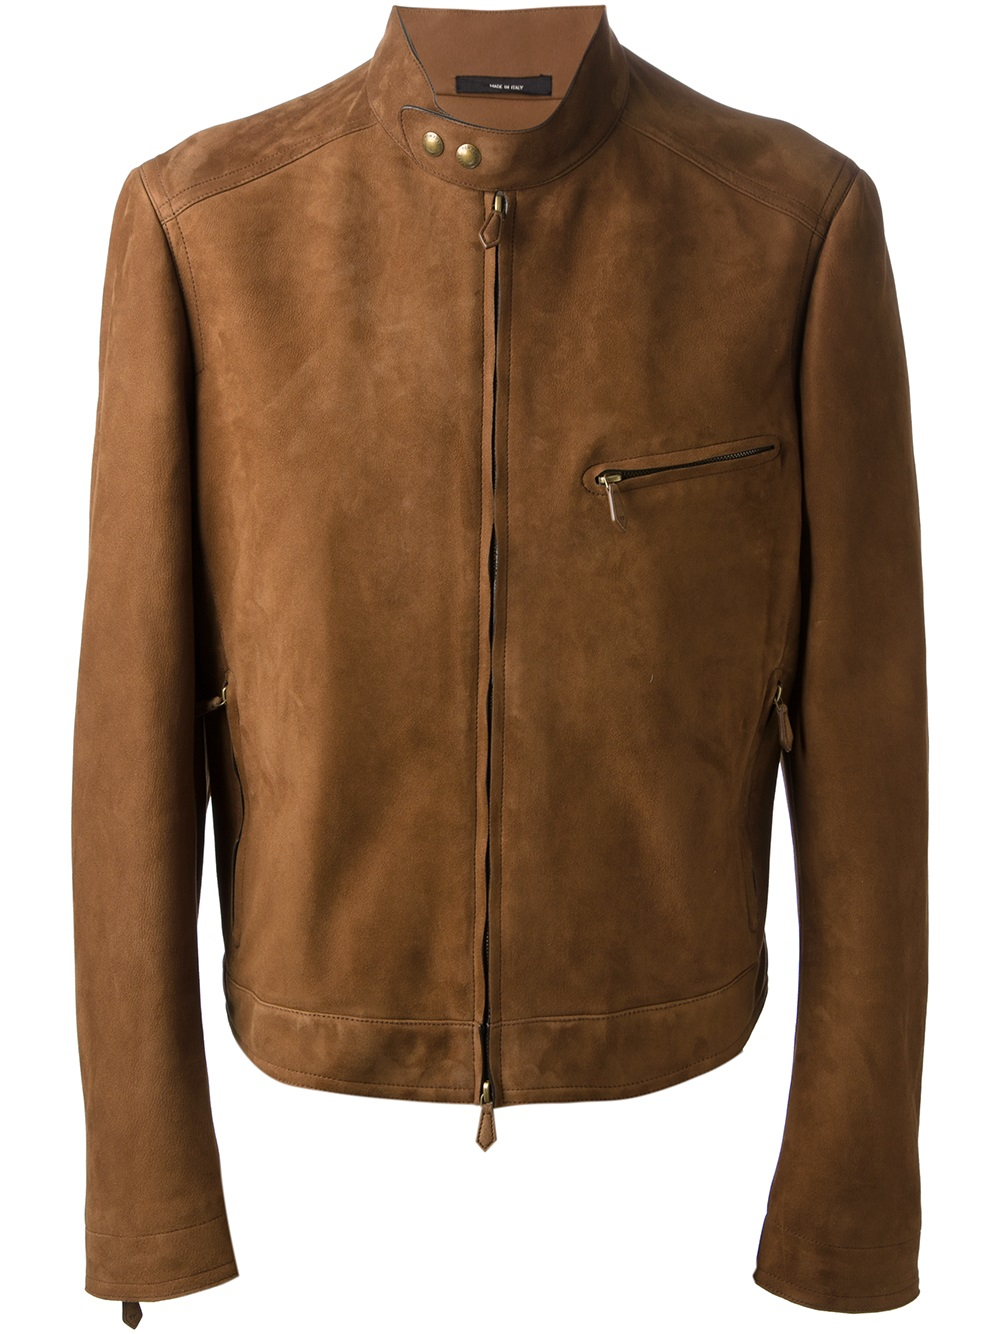 Tom wolfe leather jacket